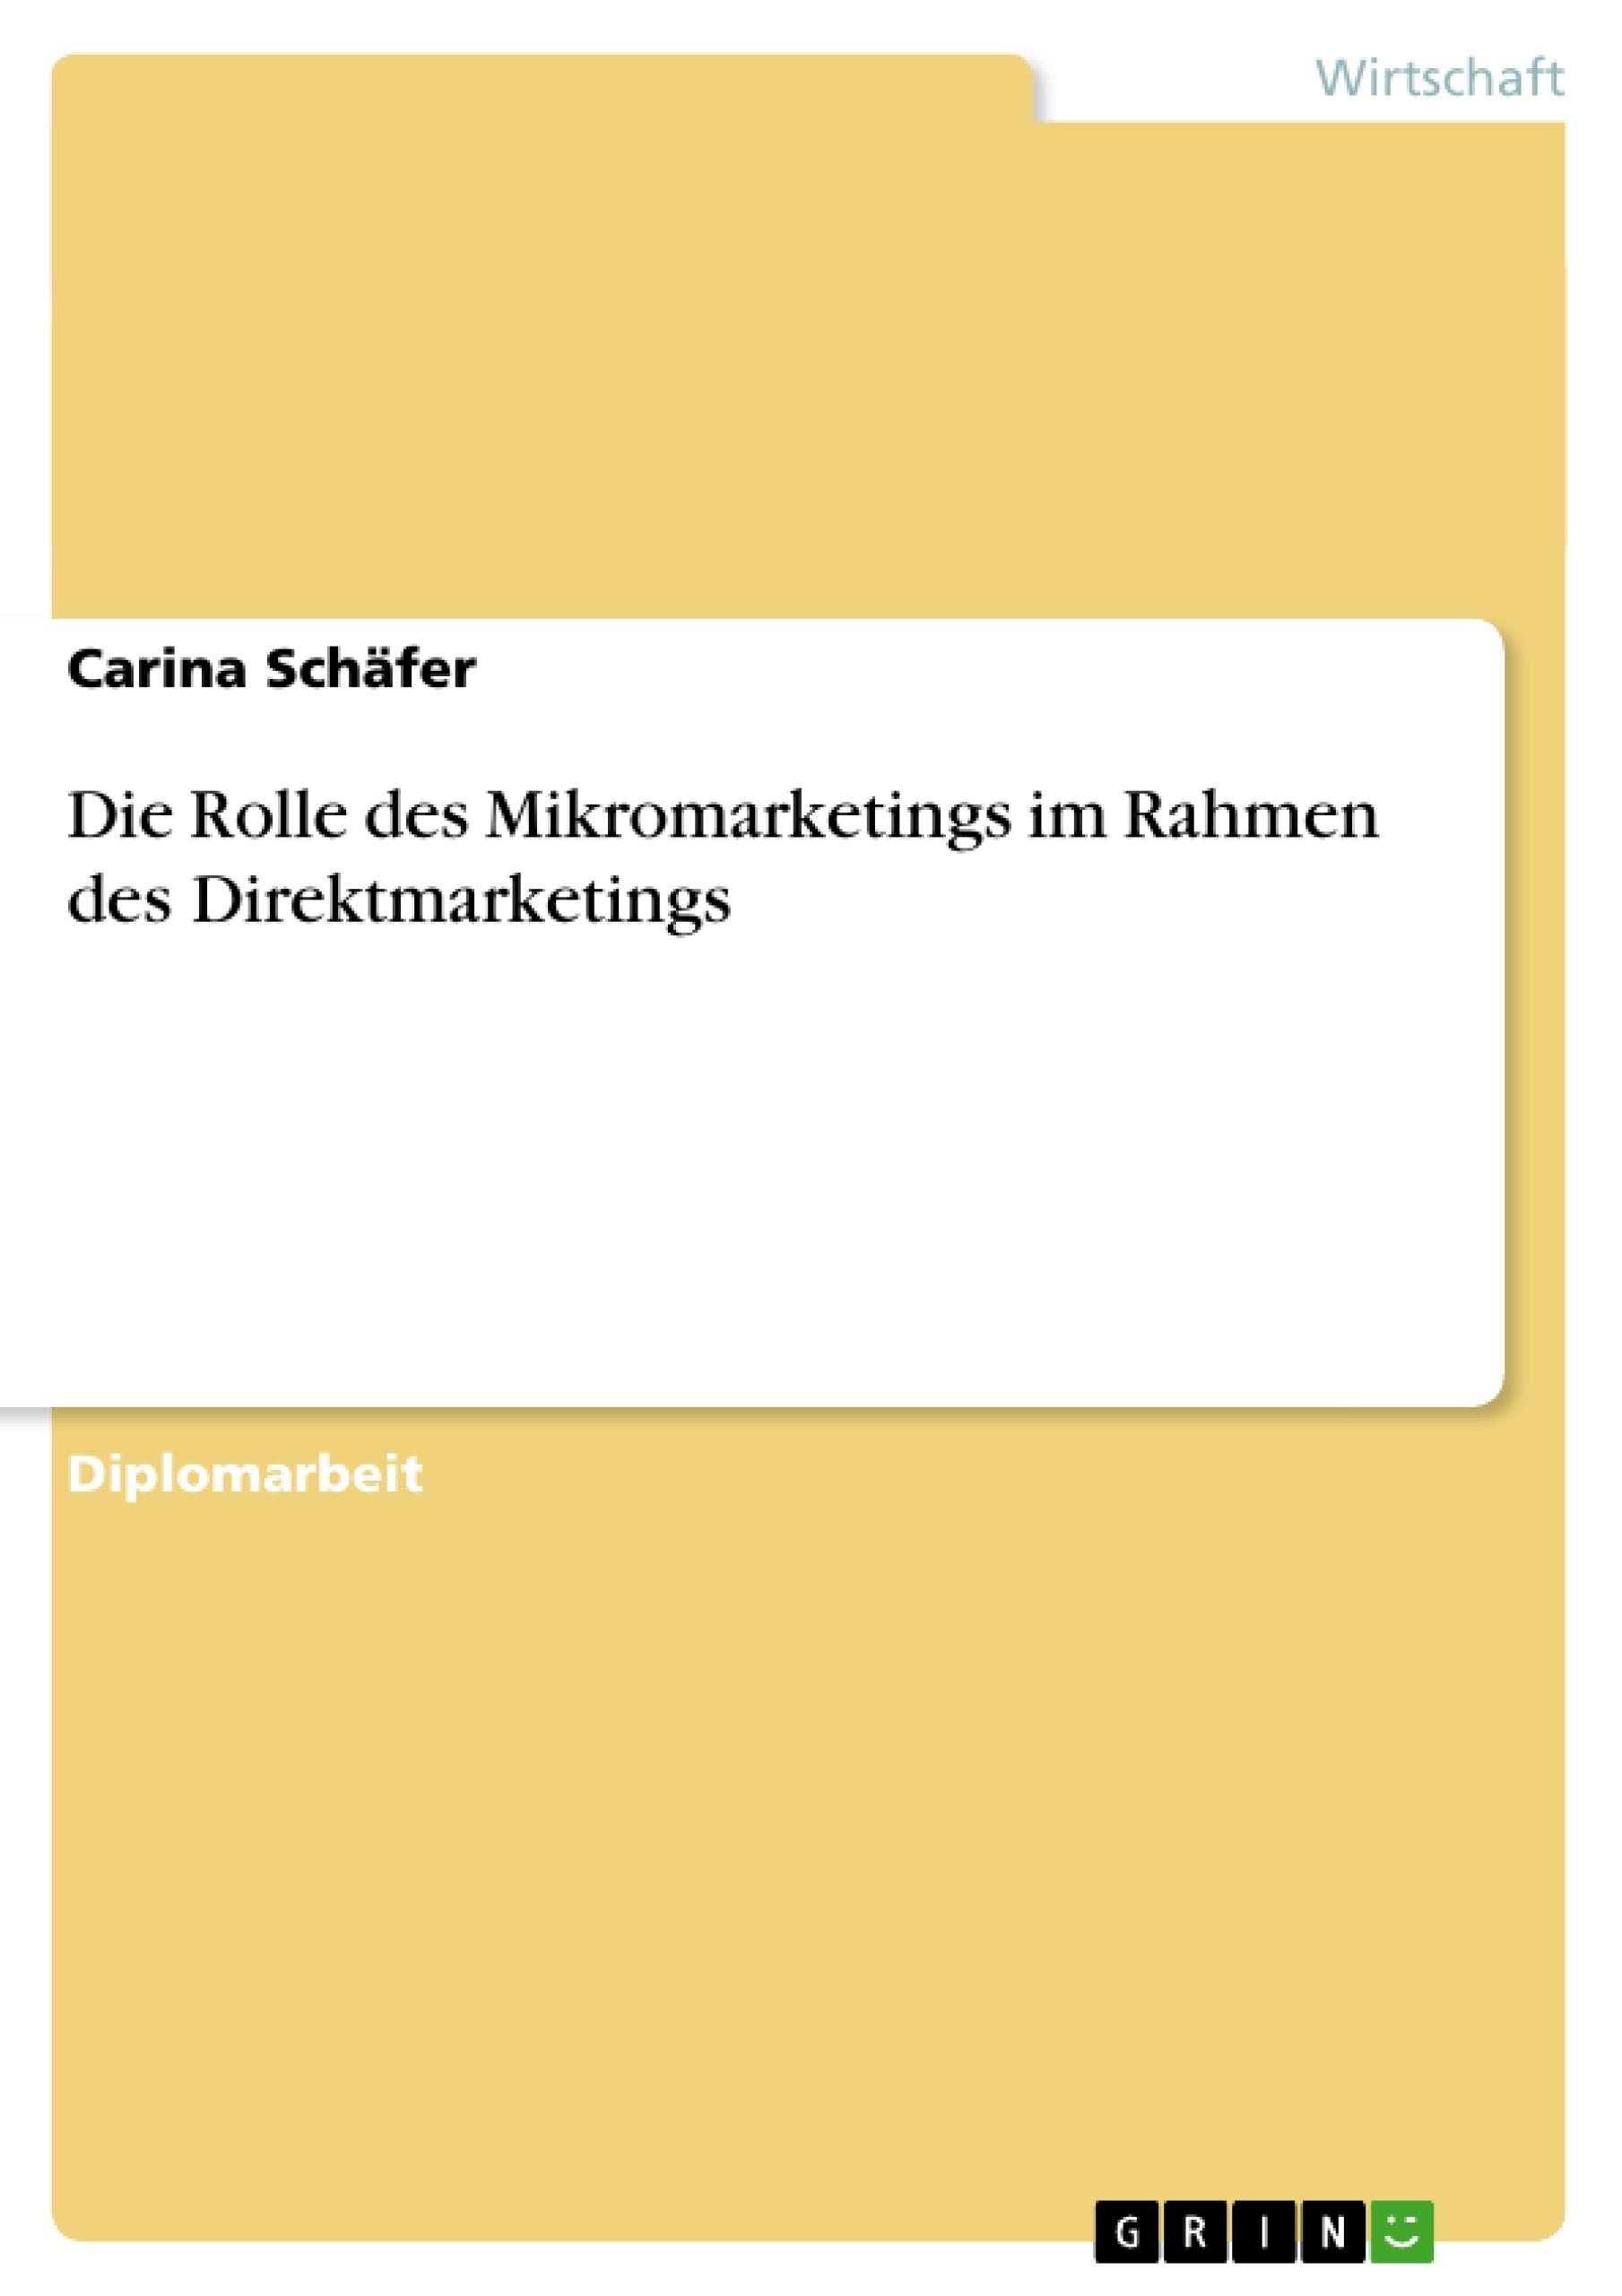 Titel: Die Rolle des Mikromarketings im Rahmen des Direktmarketings